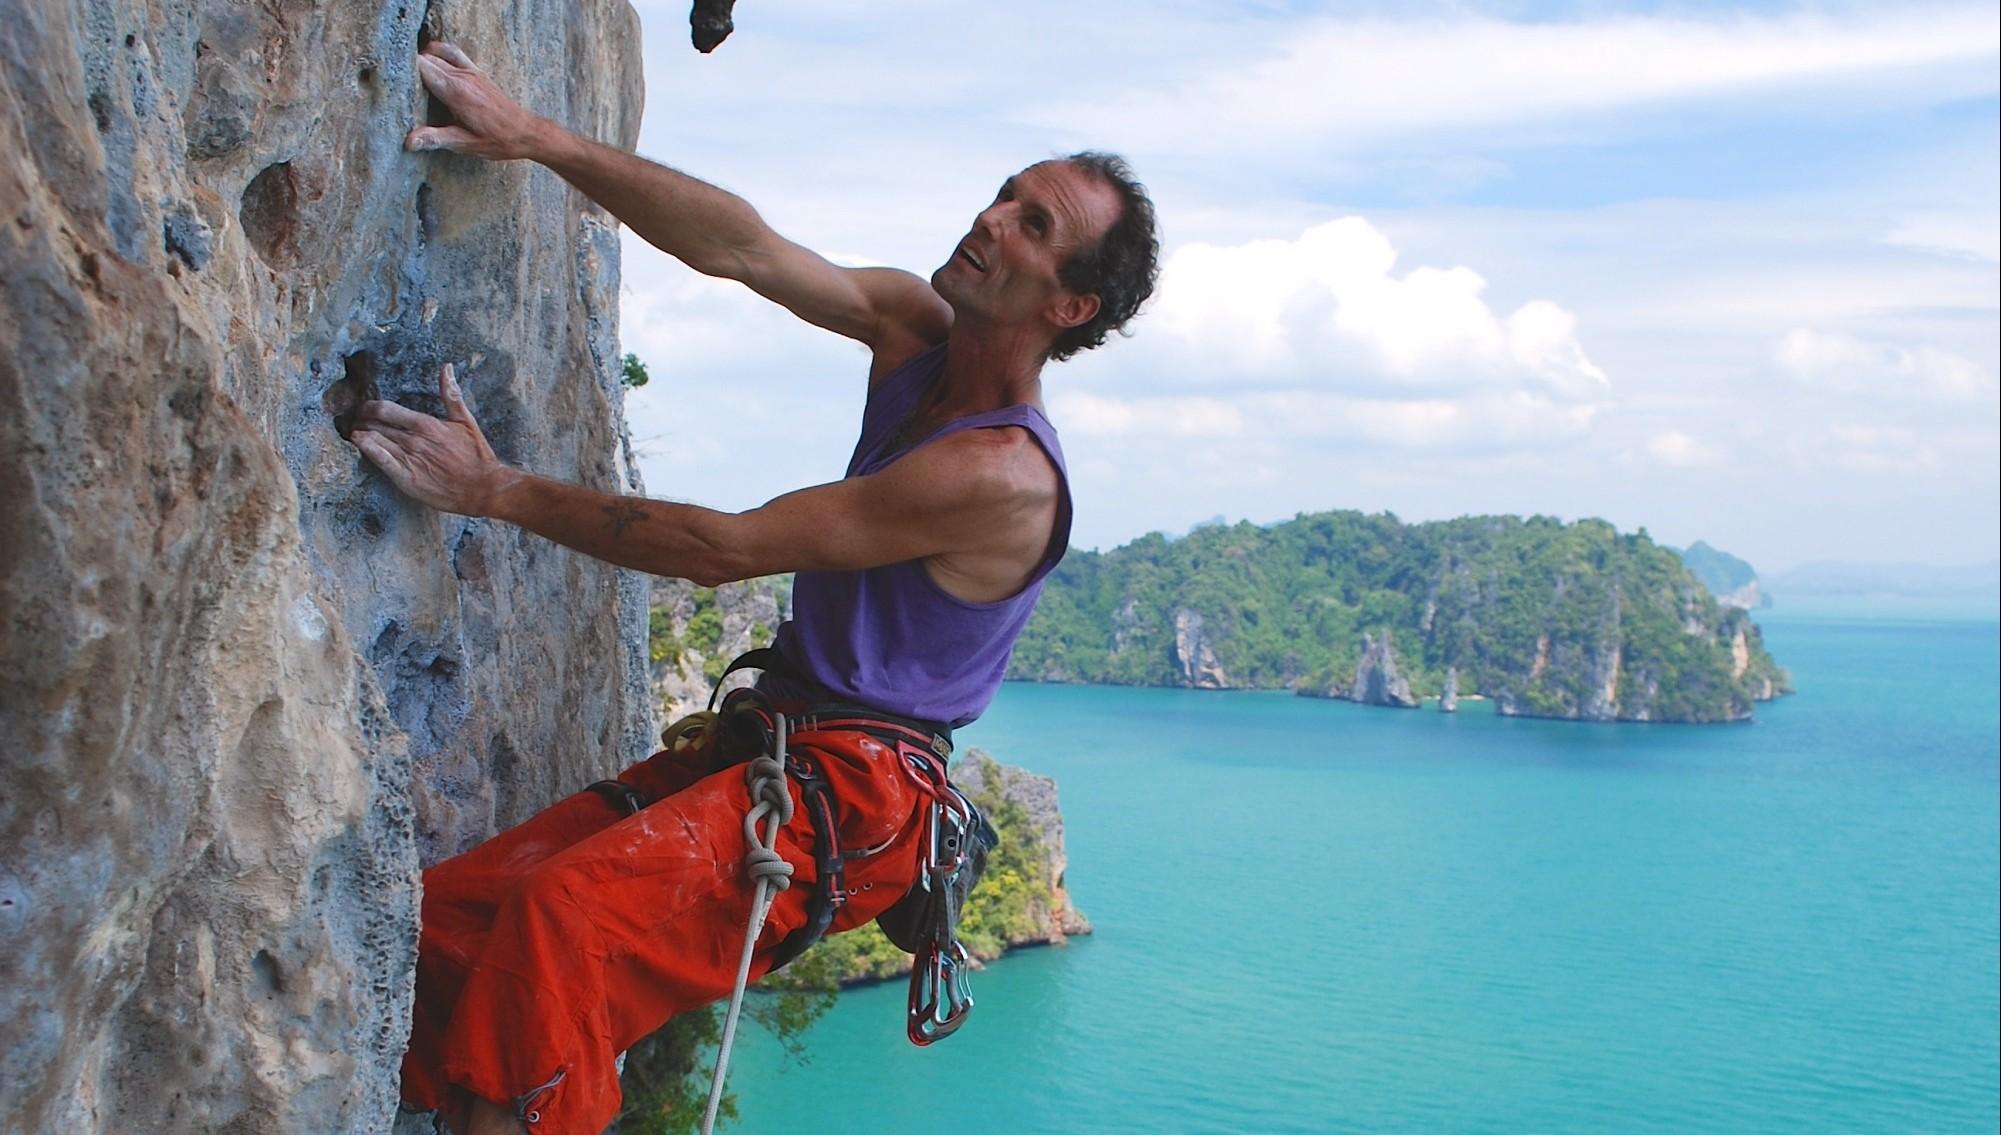 essay on experience of rock climbing